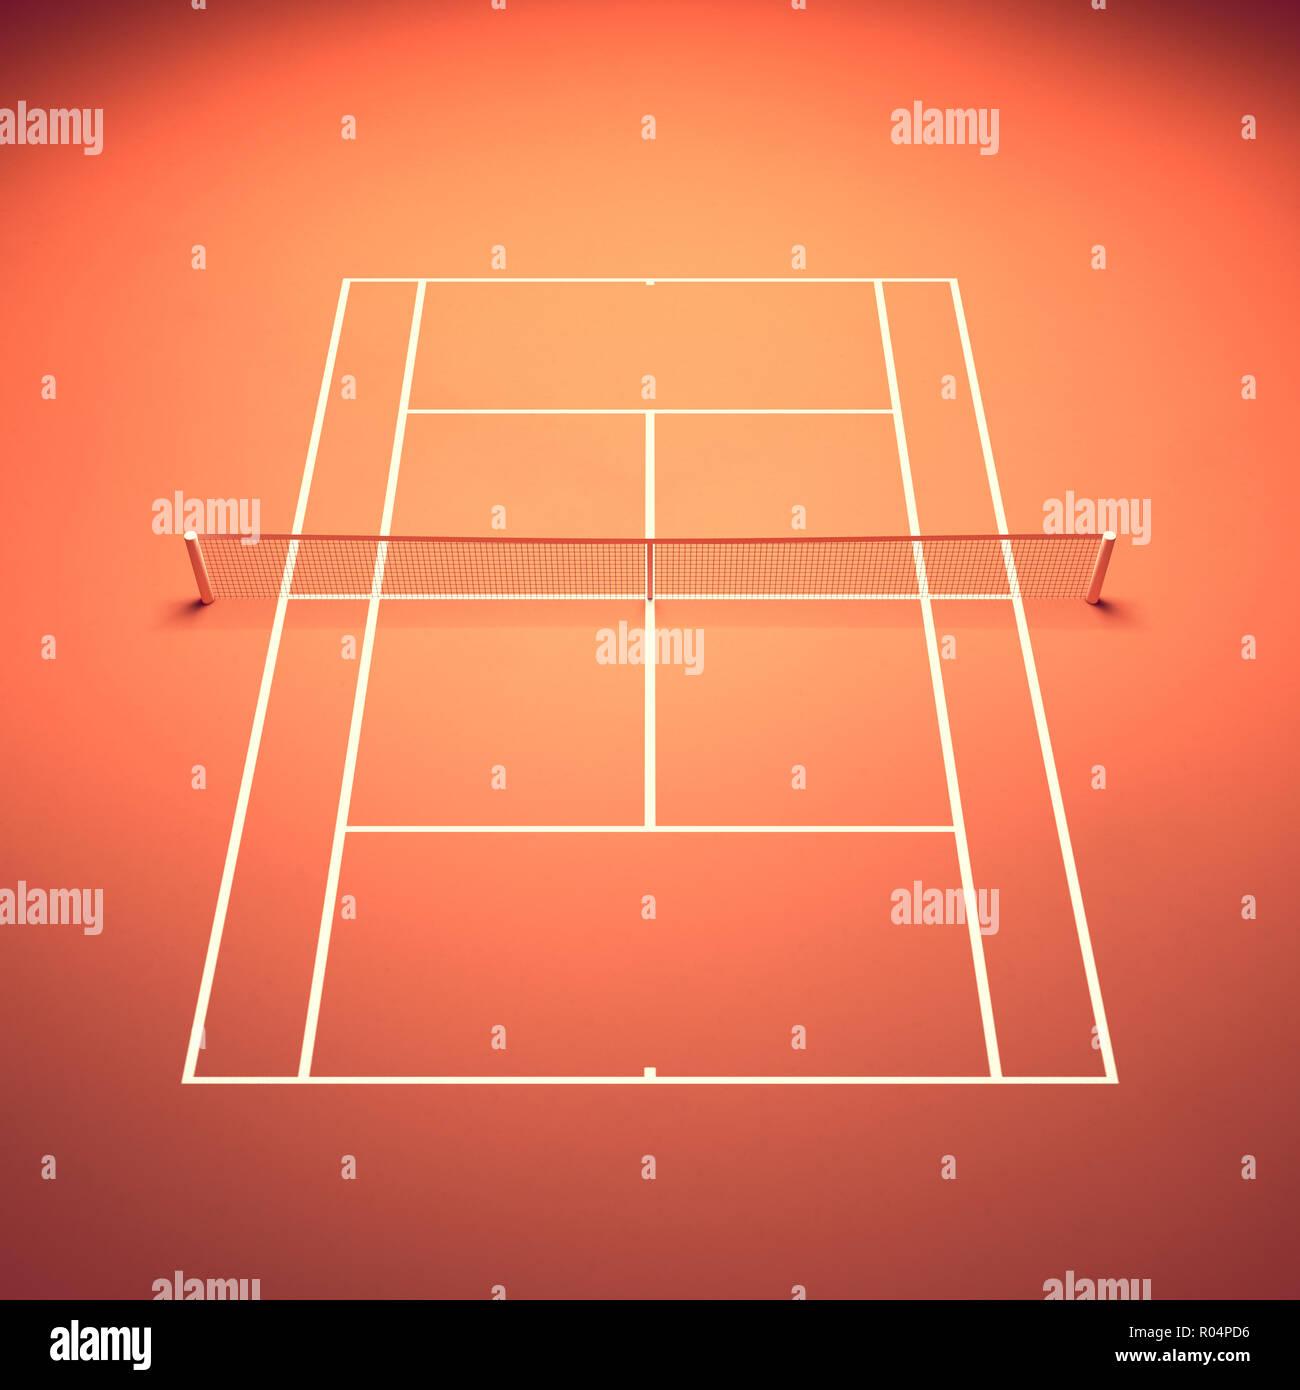 Clay Tennis Court Tennis Tournament Stock Photo 223840210 Alamy